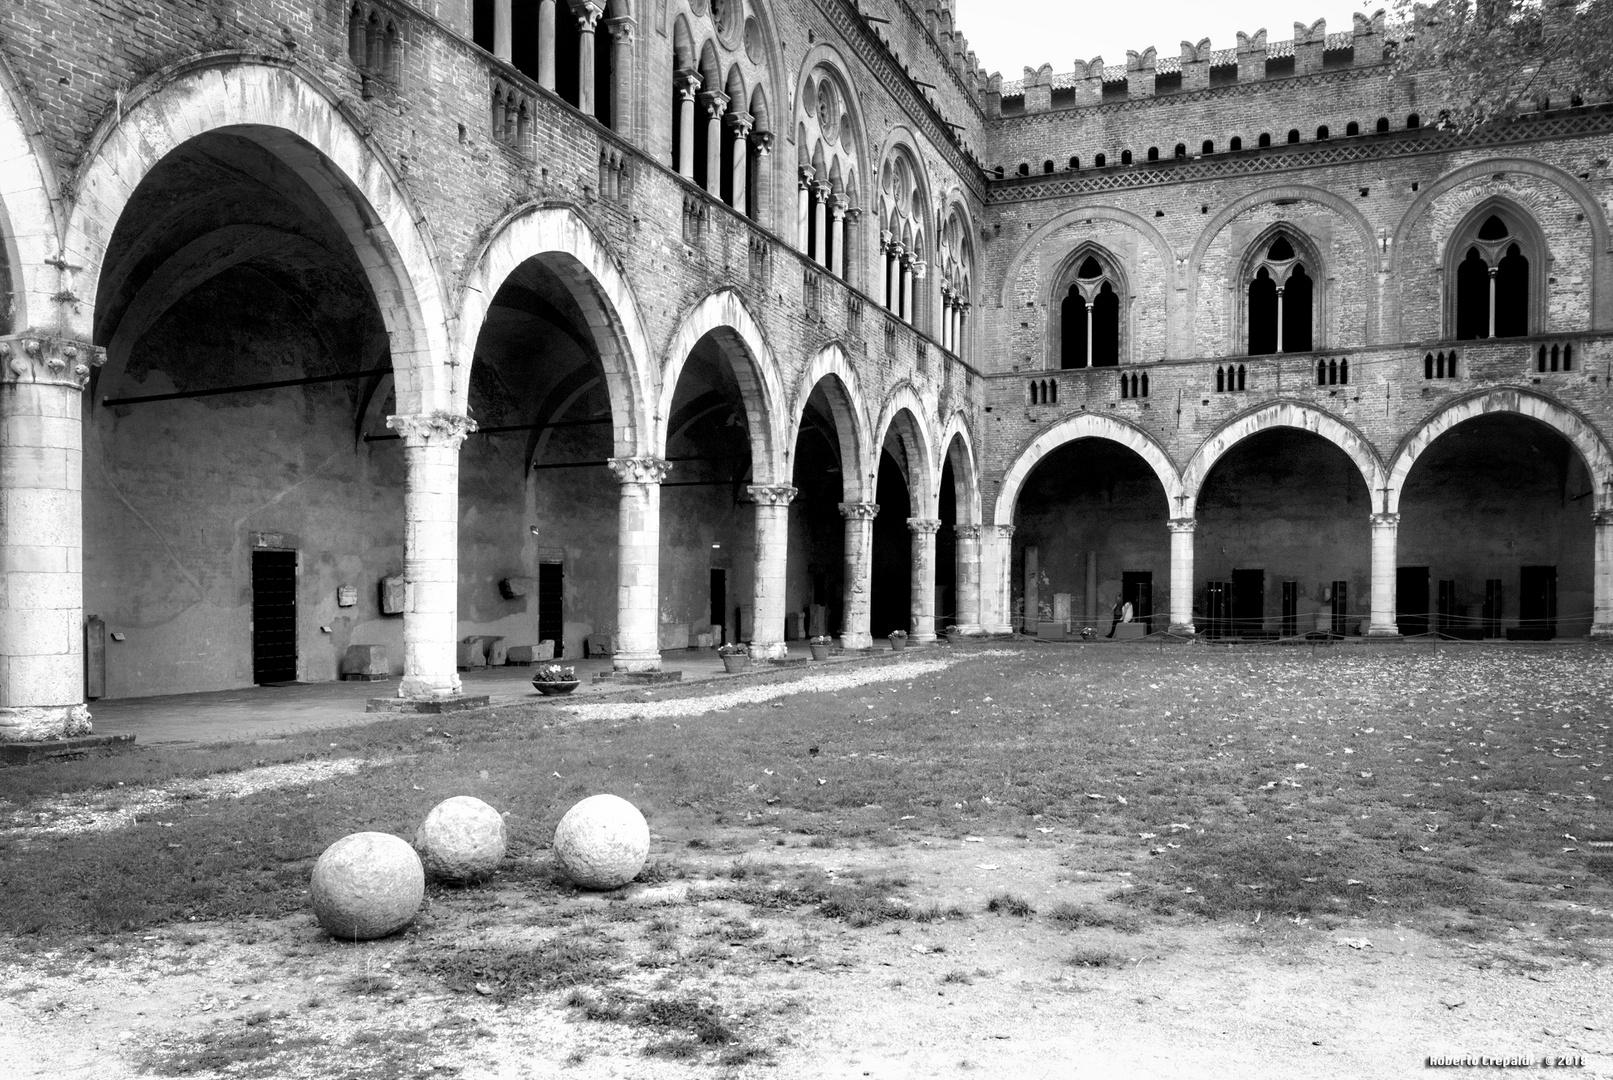 Pavia, castello Visconteo